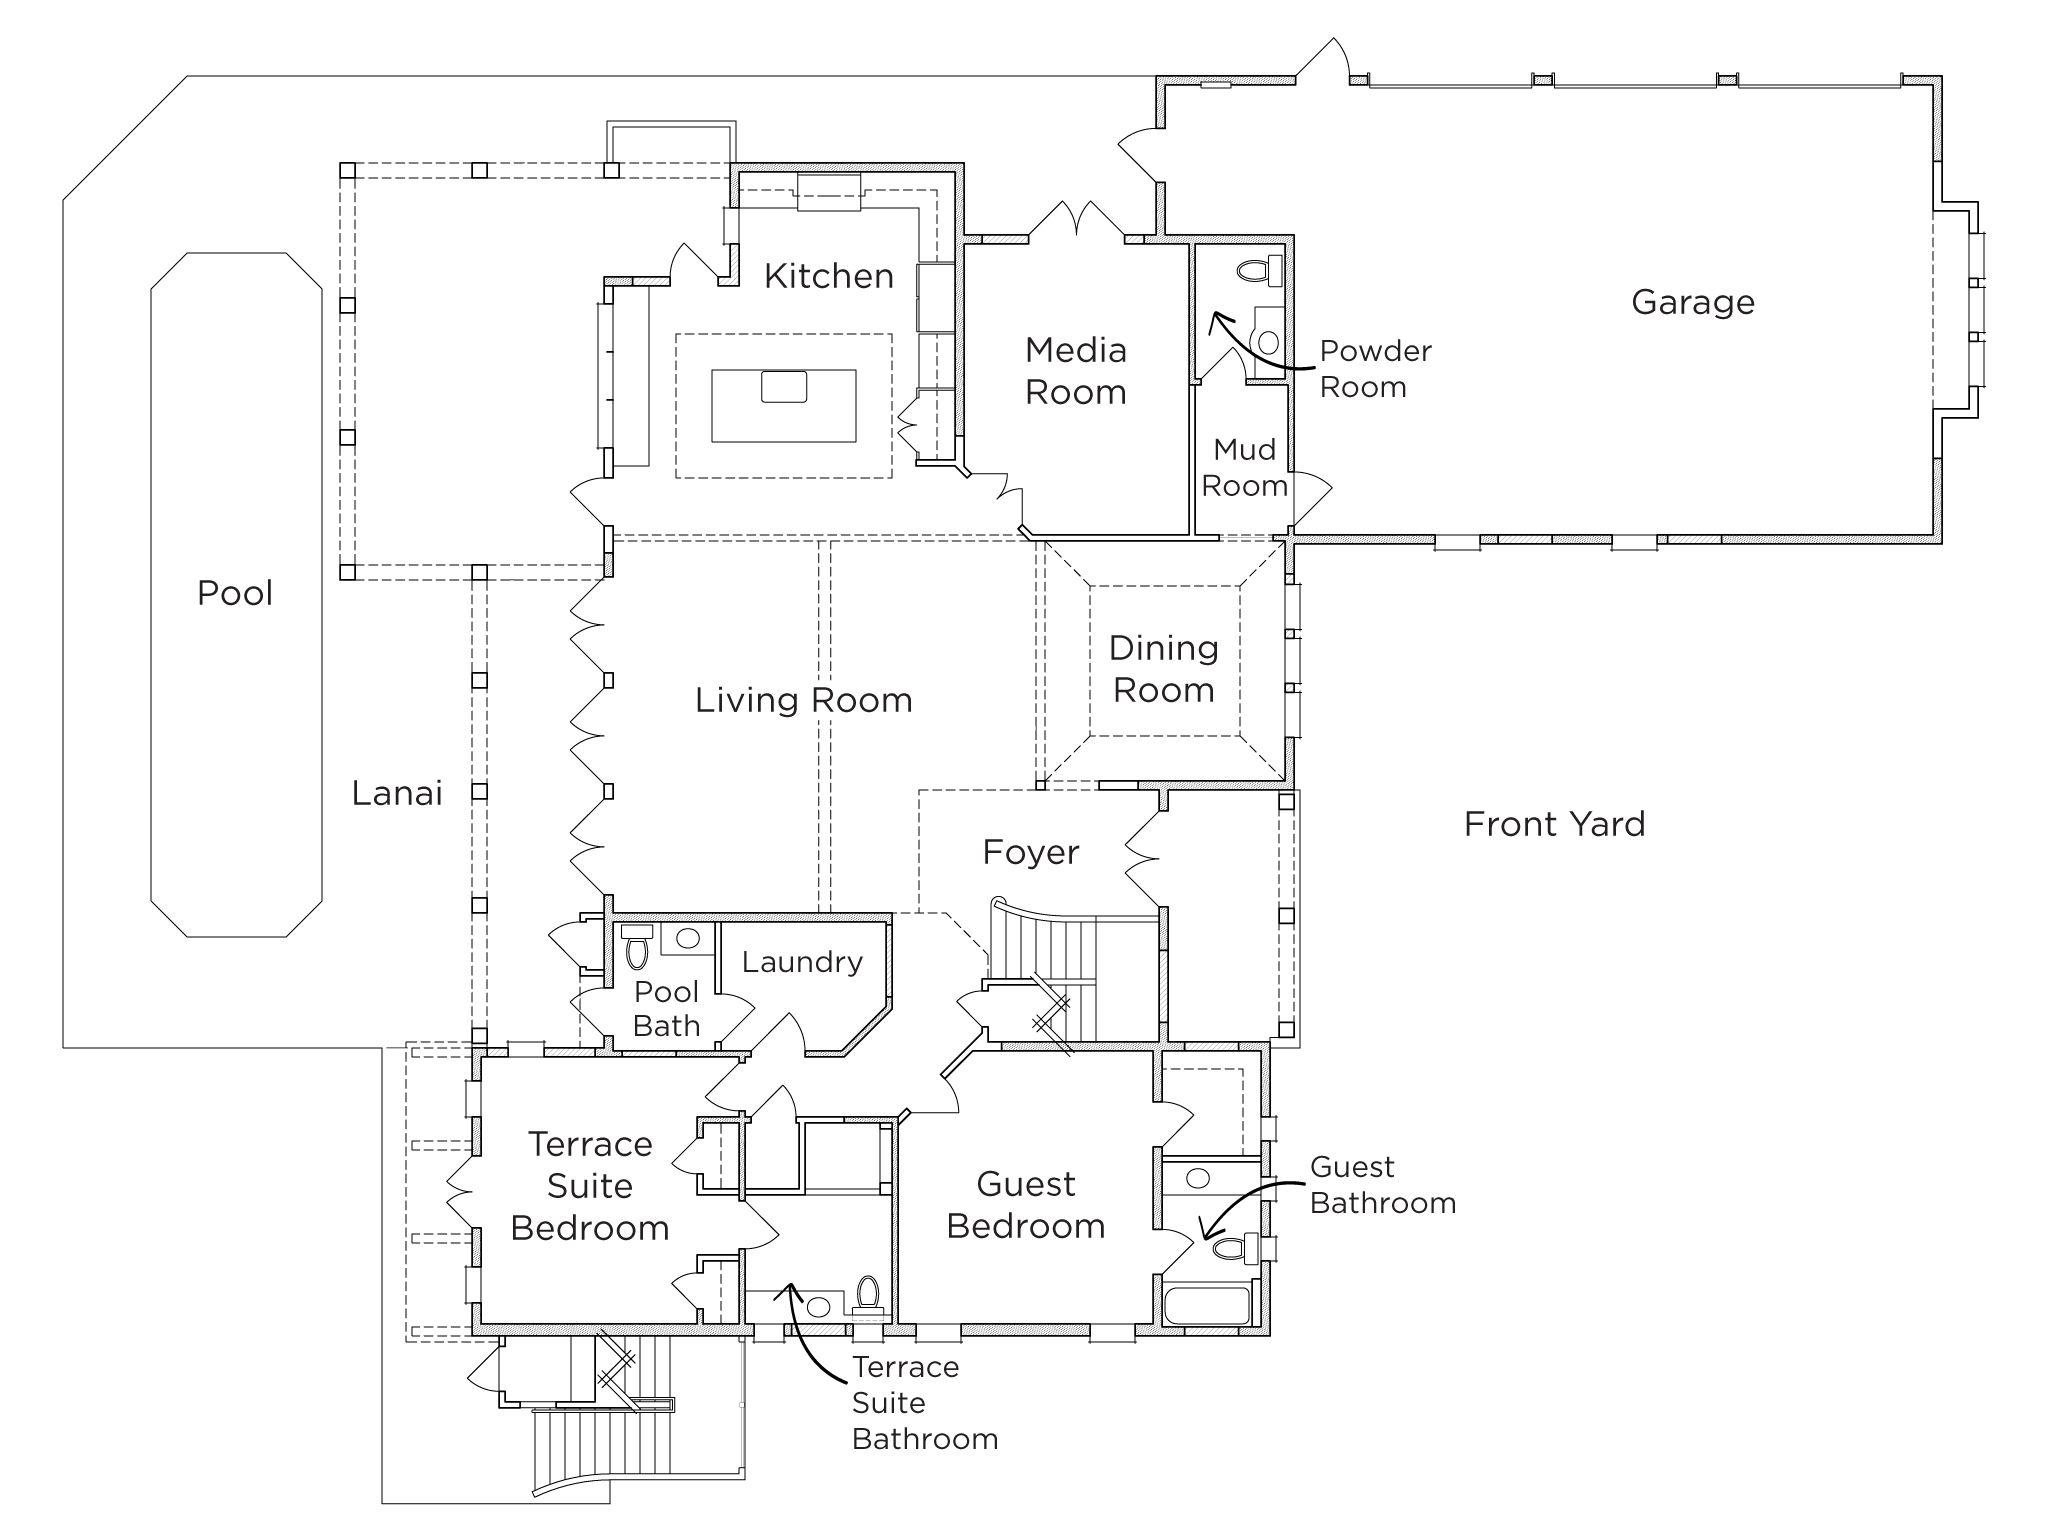 Small Kitchen Design: Smart Layouts & Storage Photos